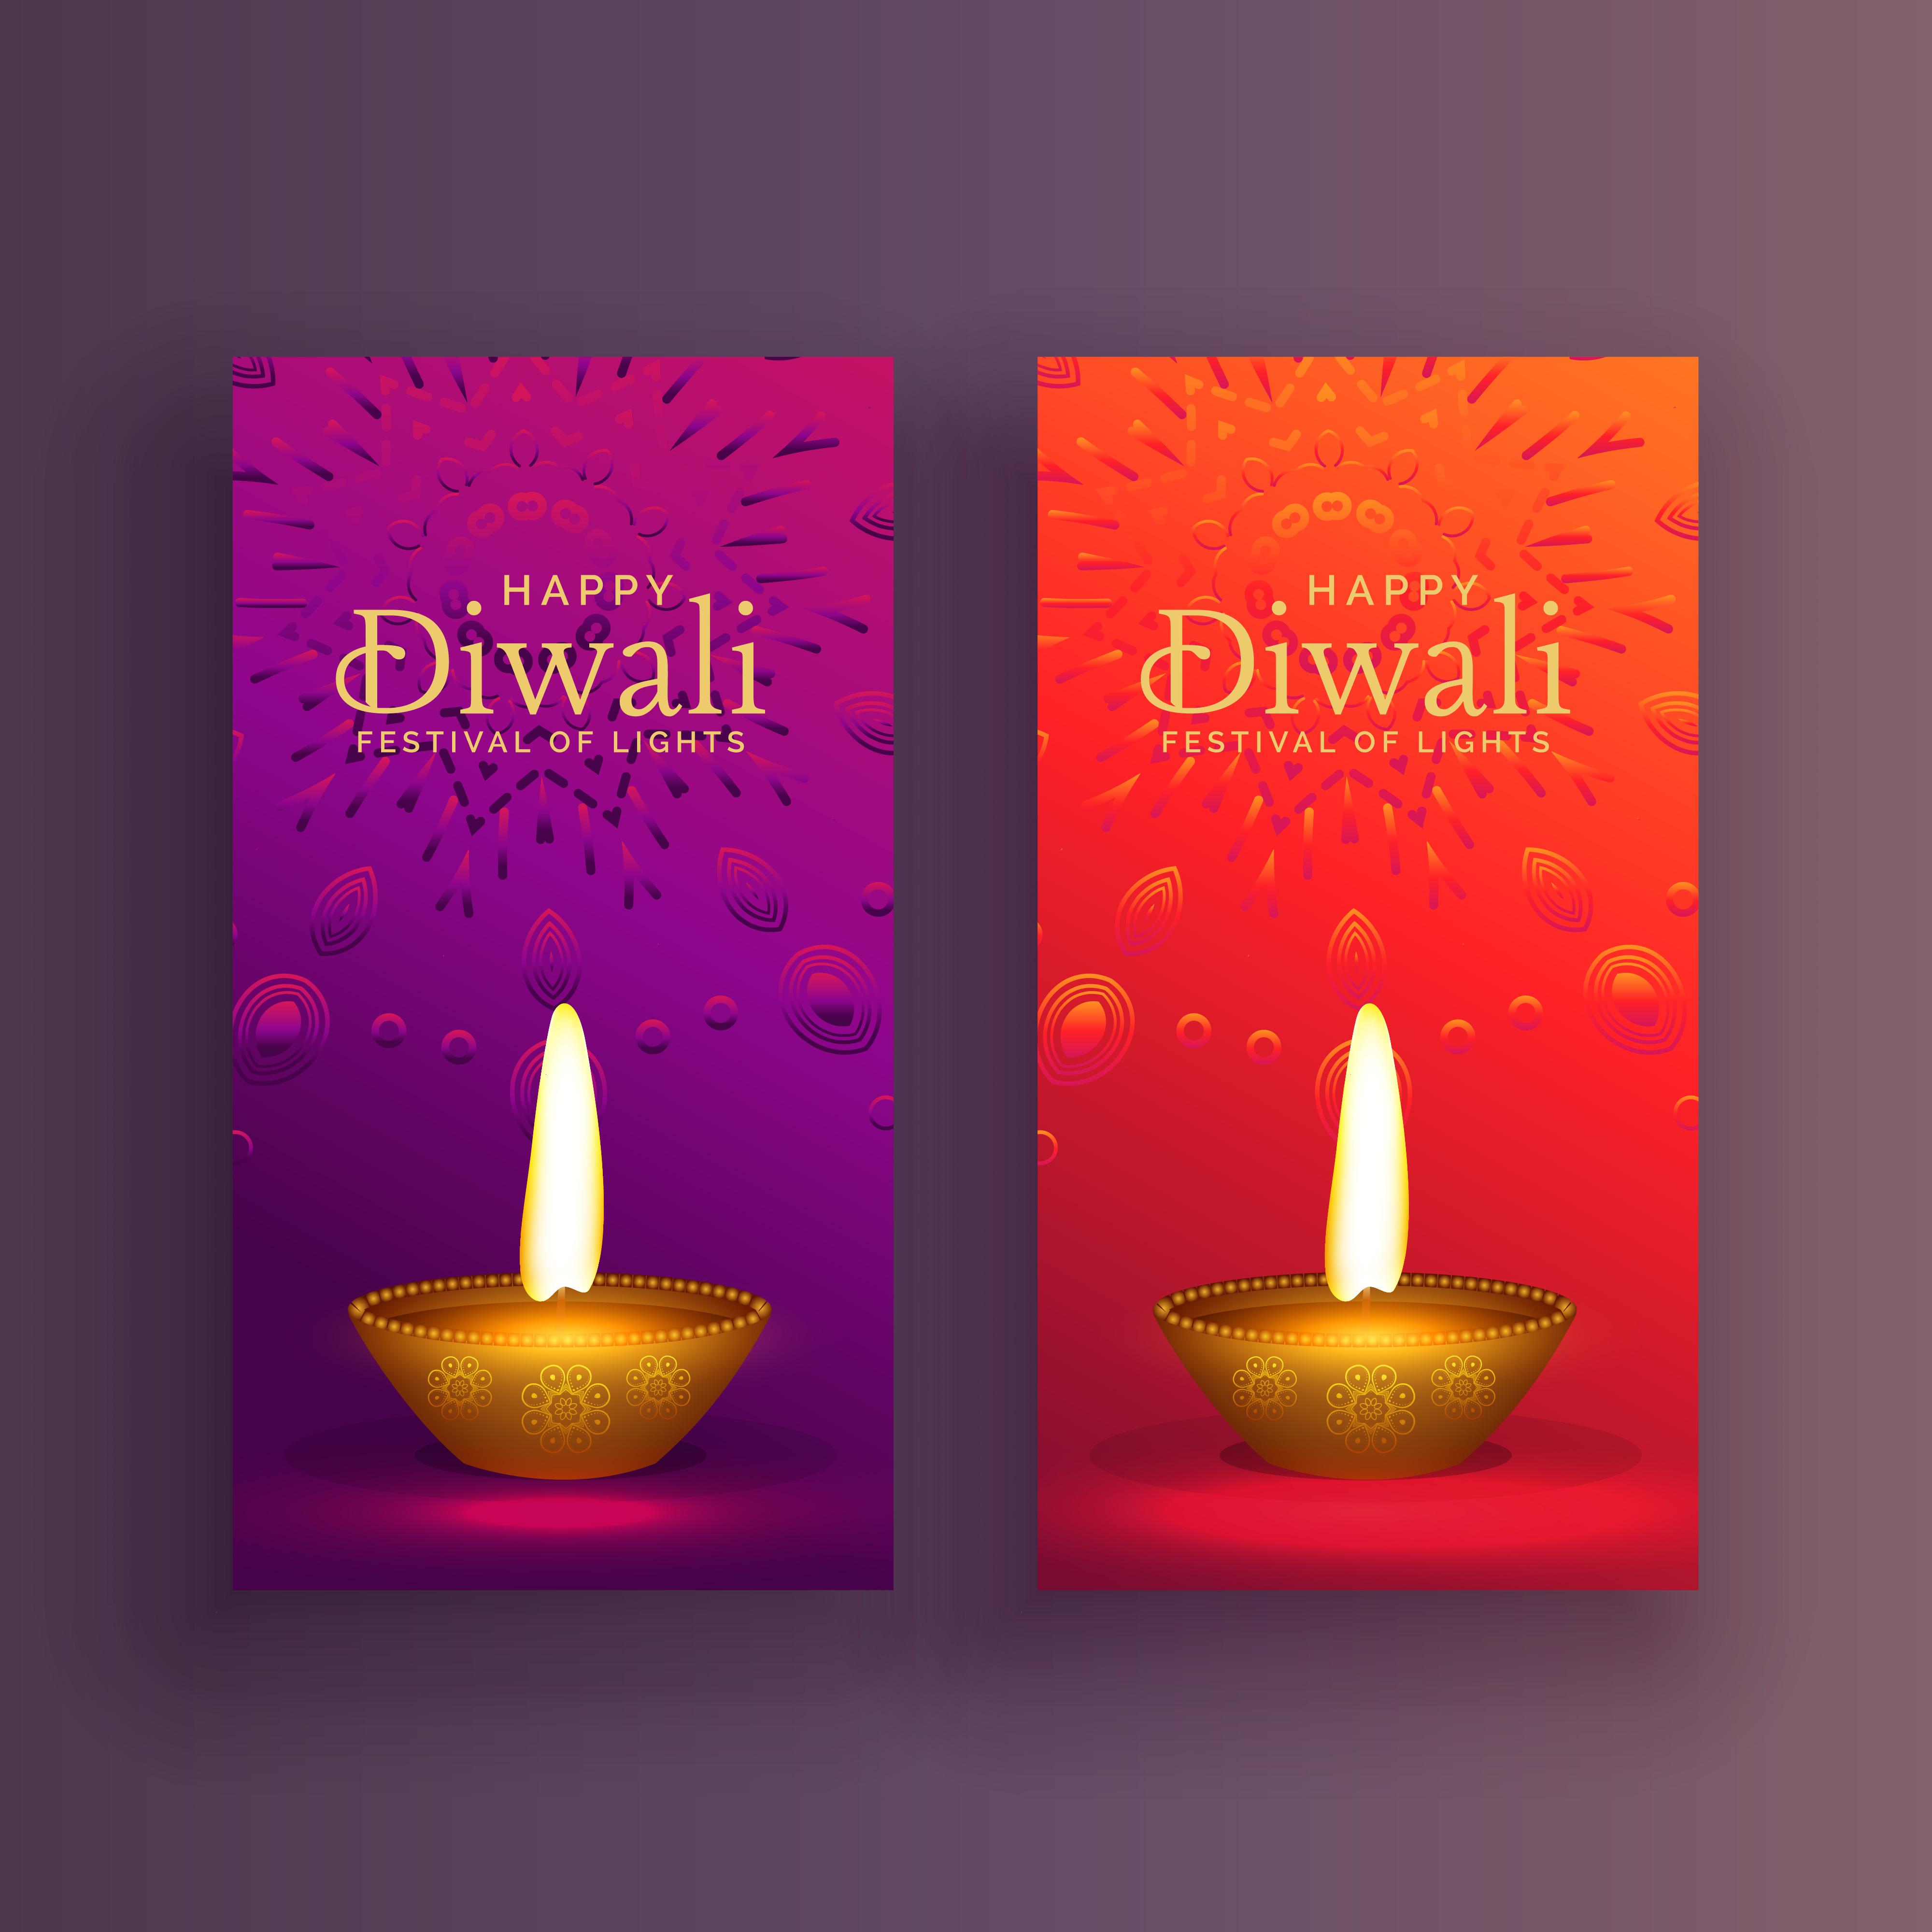 Happy Diwali Card Banner Design Background Download Free Vector